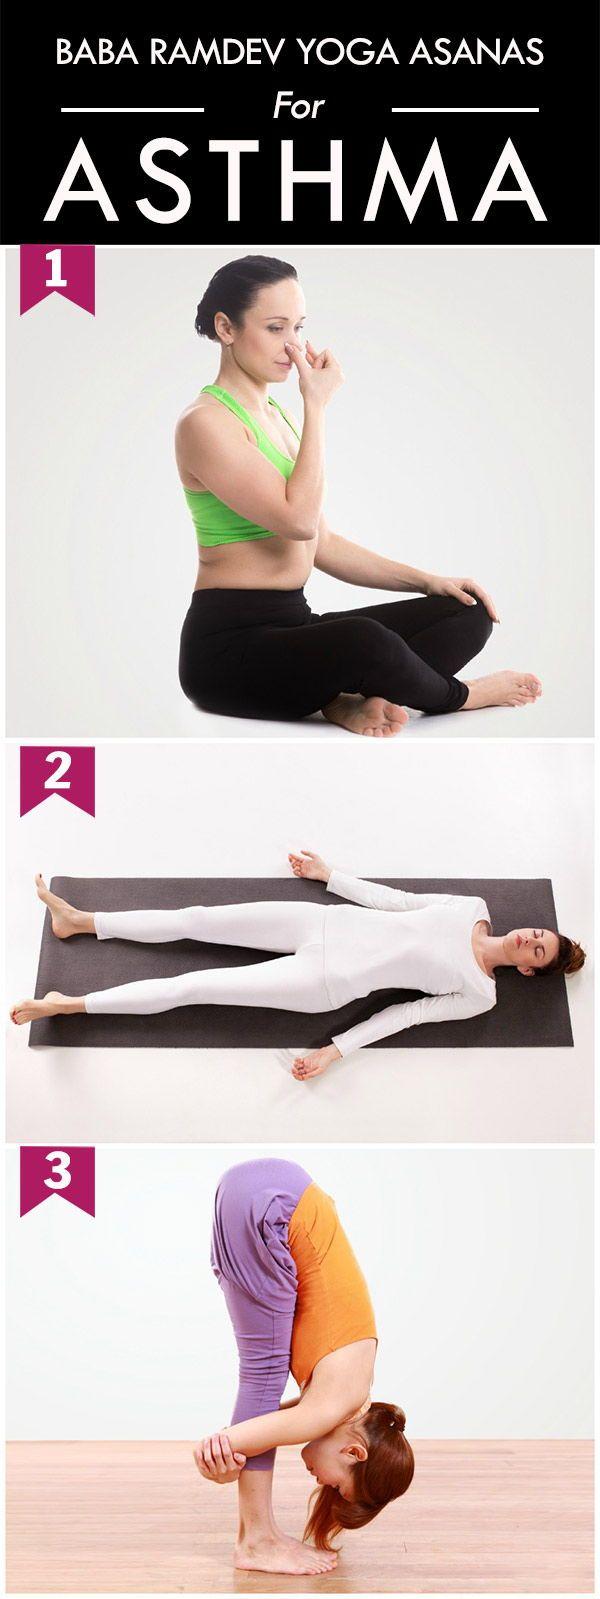 Fight asthma with this yoga poses. #yoga #yogaeverydamnday #yogalove #yogachalle...